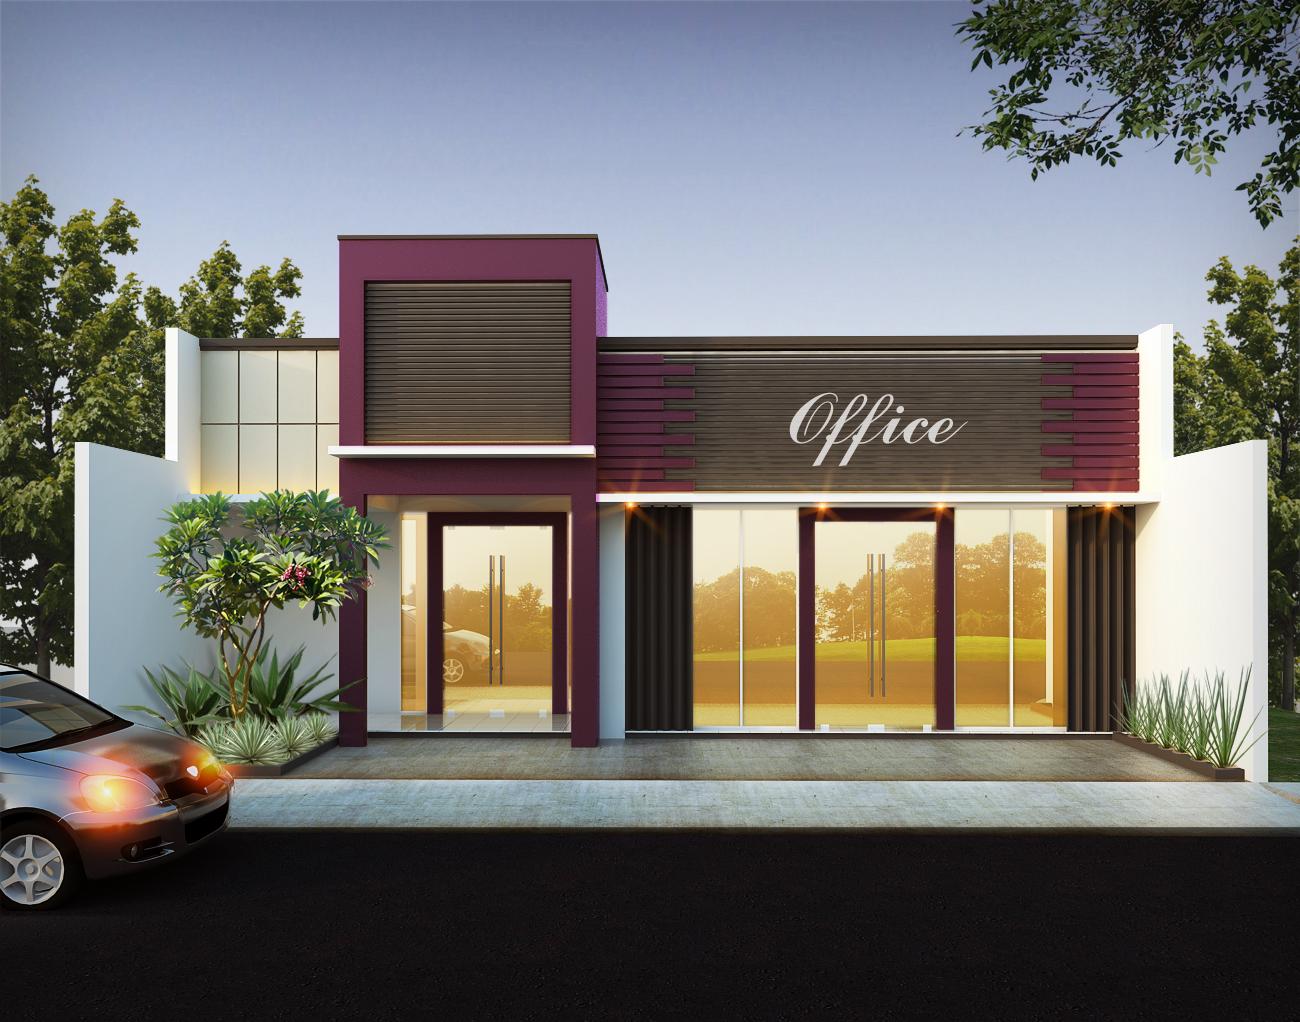 20 Model Desain Kios Minimalis Modern Terbaru 2020